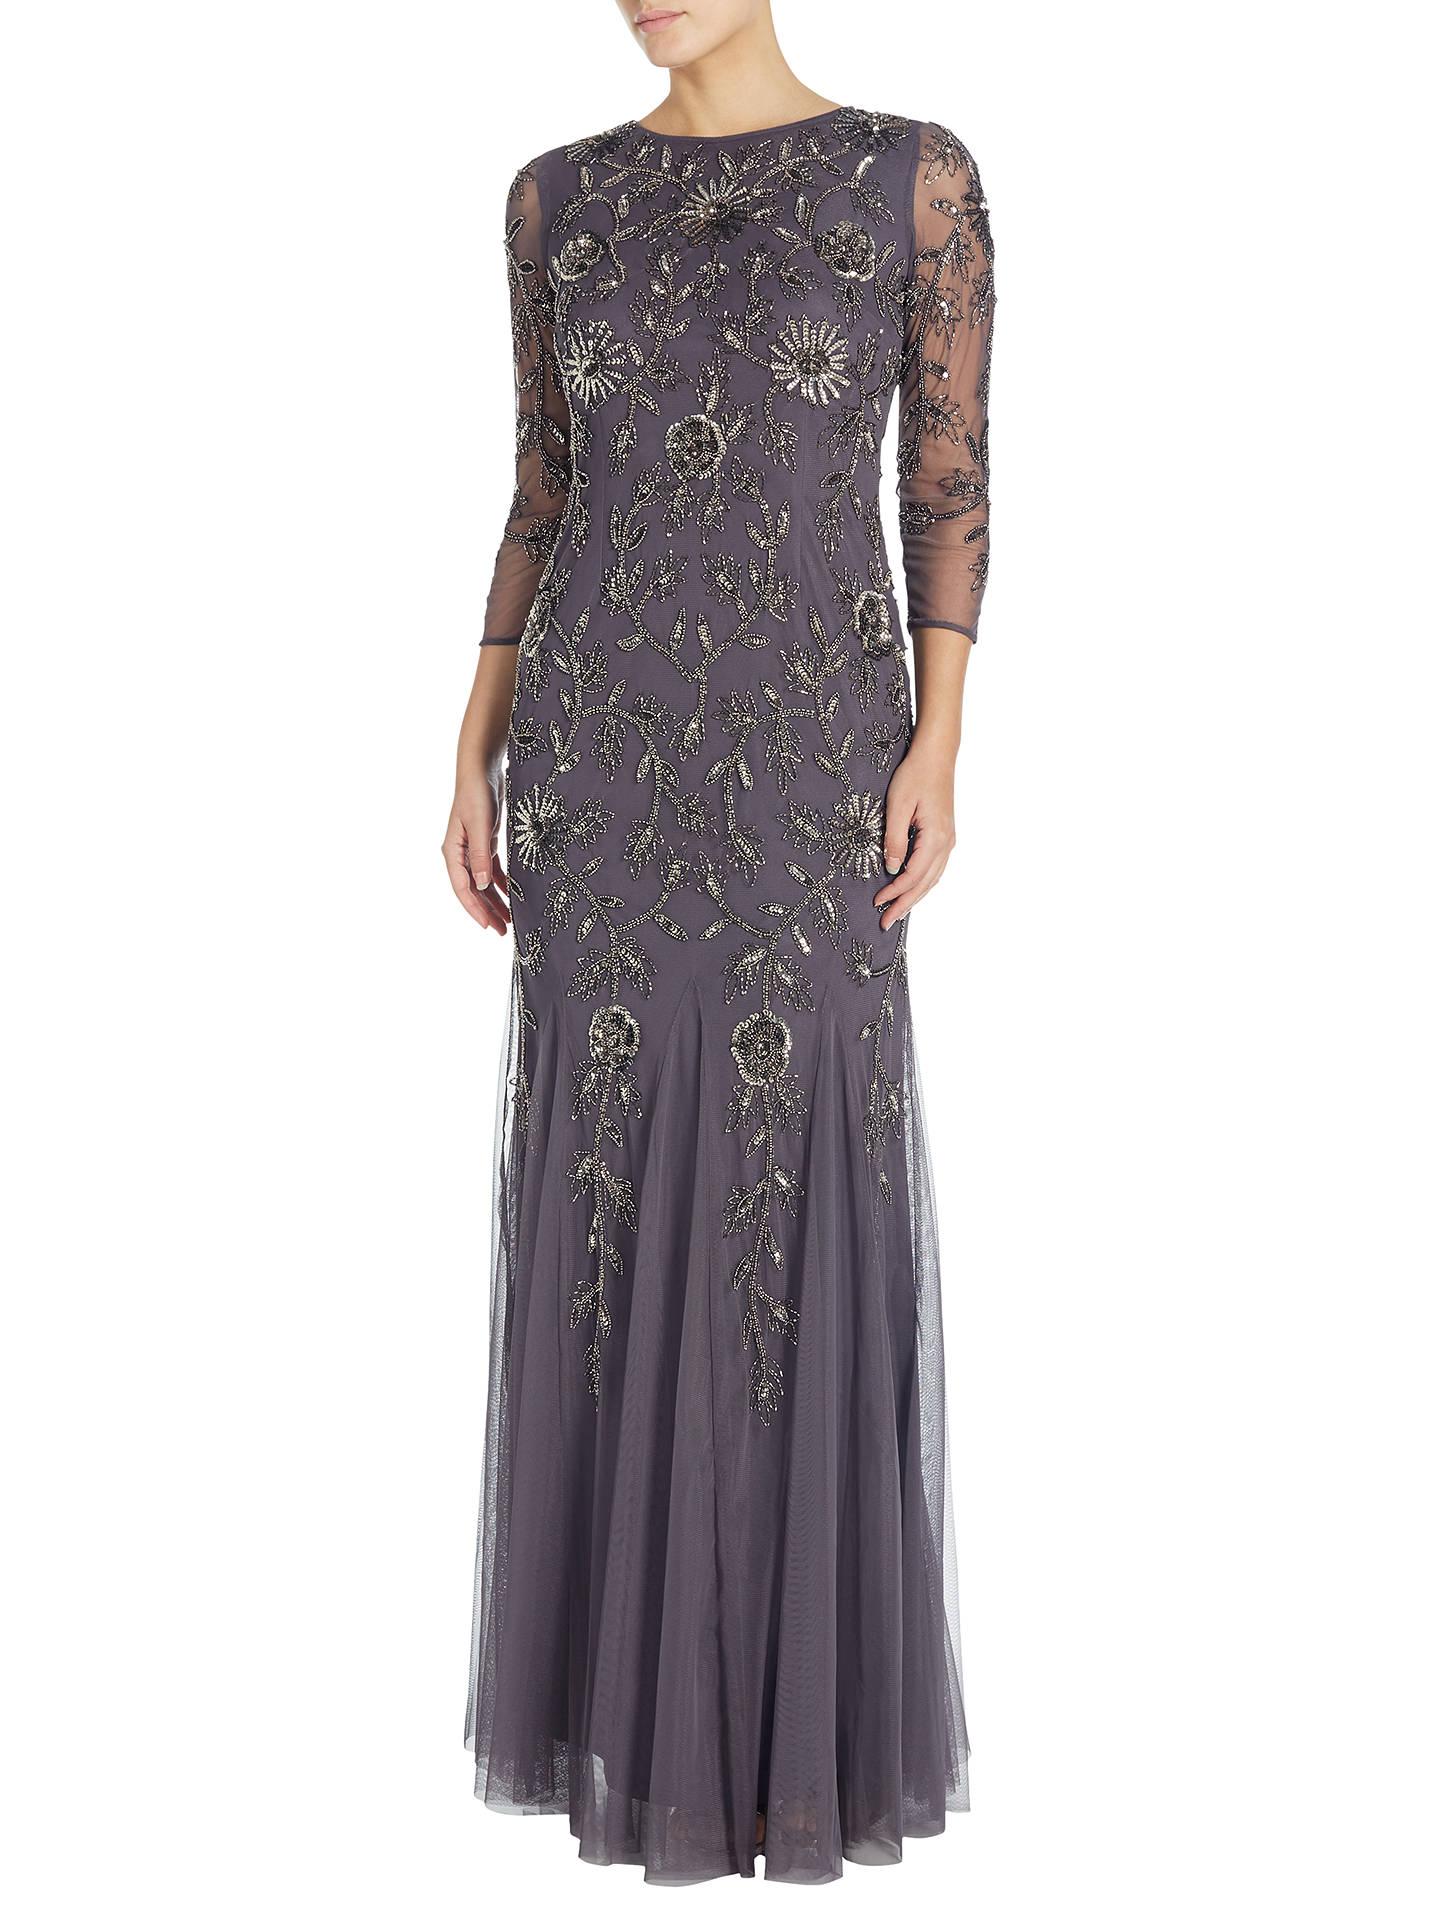 Adrianna Papell Beaded Mermaid Gown, Gunmetal at John Lewis & Partners